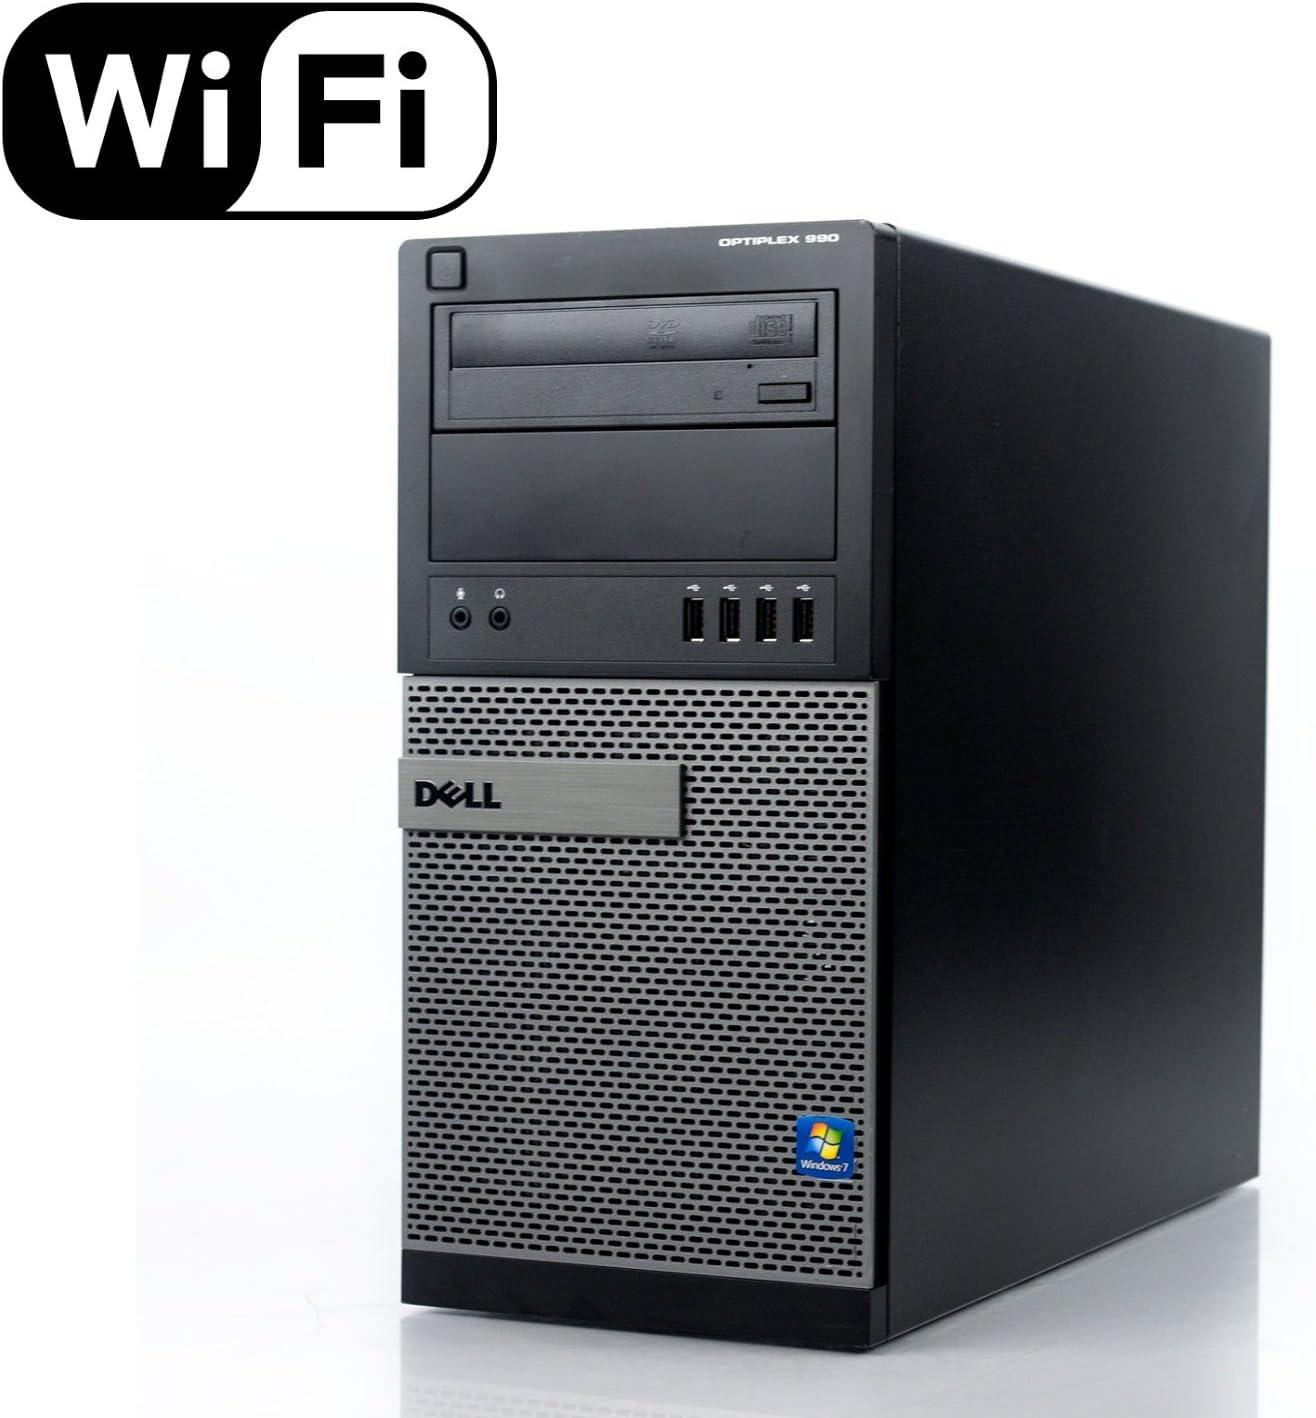 Dell Optiplex 990 Tower Business Desktop Computer, Intel Quad Core i5-2400 up to 3.4Ghz CPU, 8GB DDR3 RAM, 500GB HDD, DVD, VGA, Windows 10 Professional Renewed